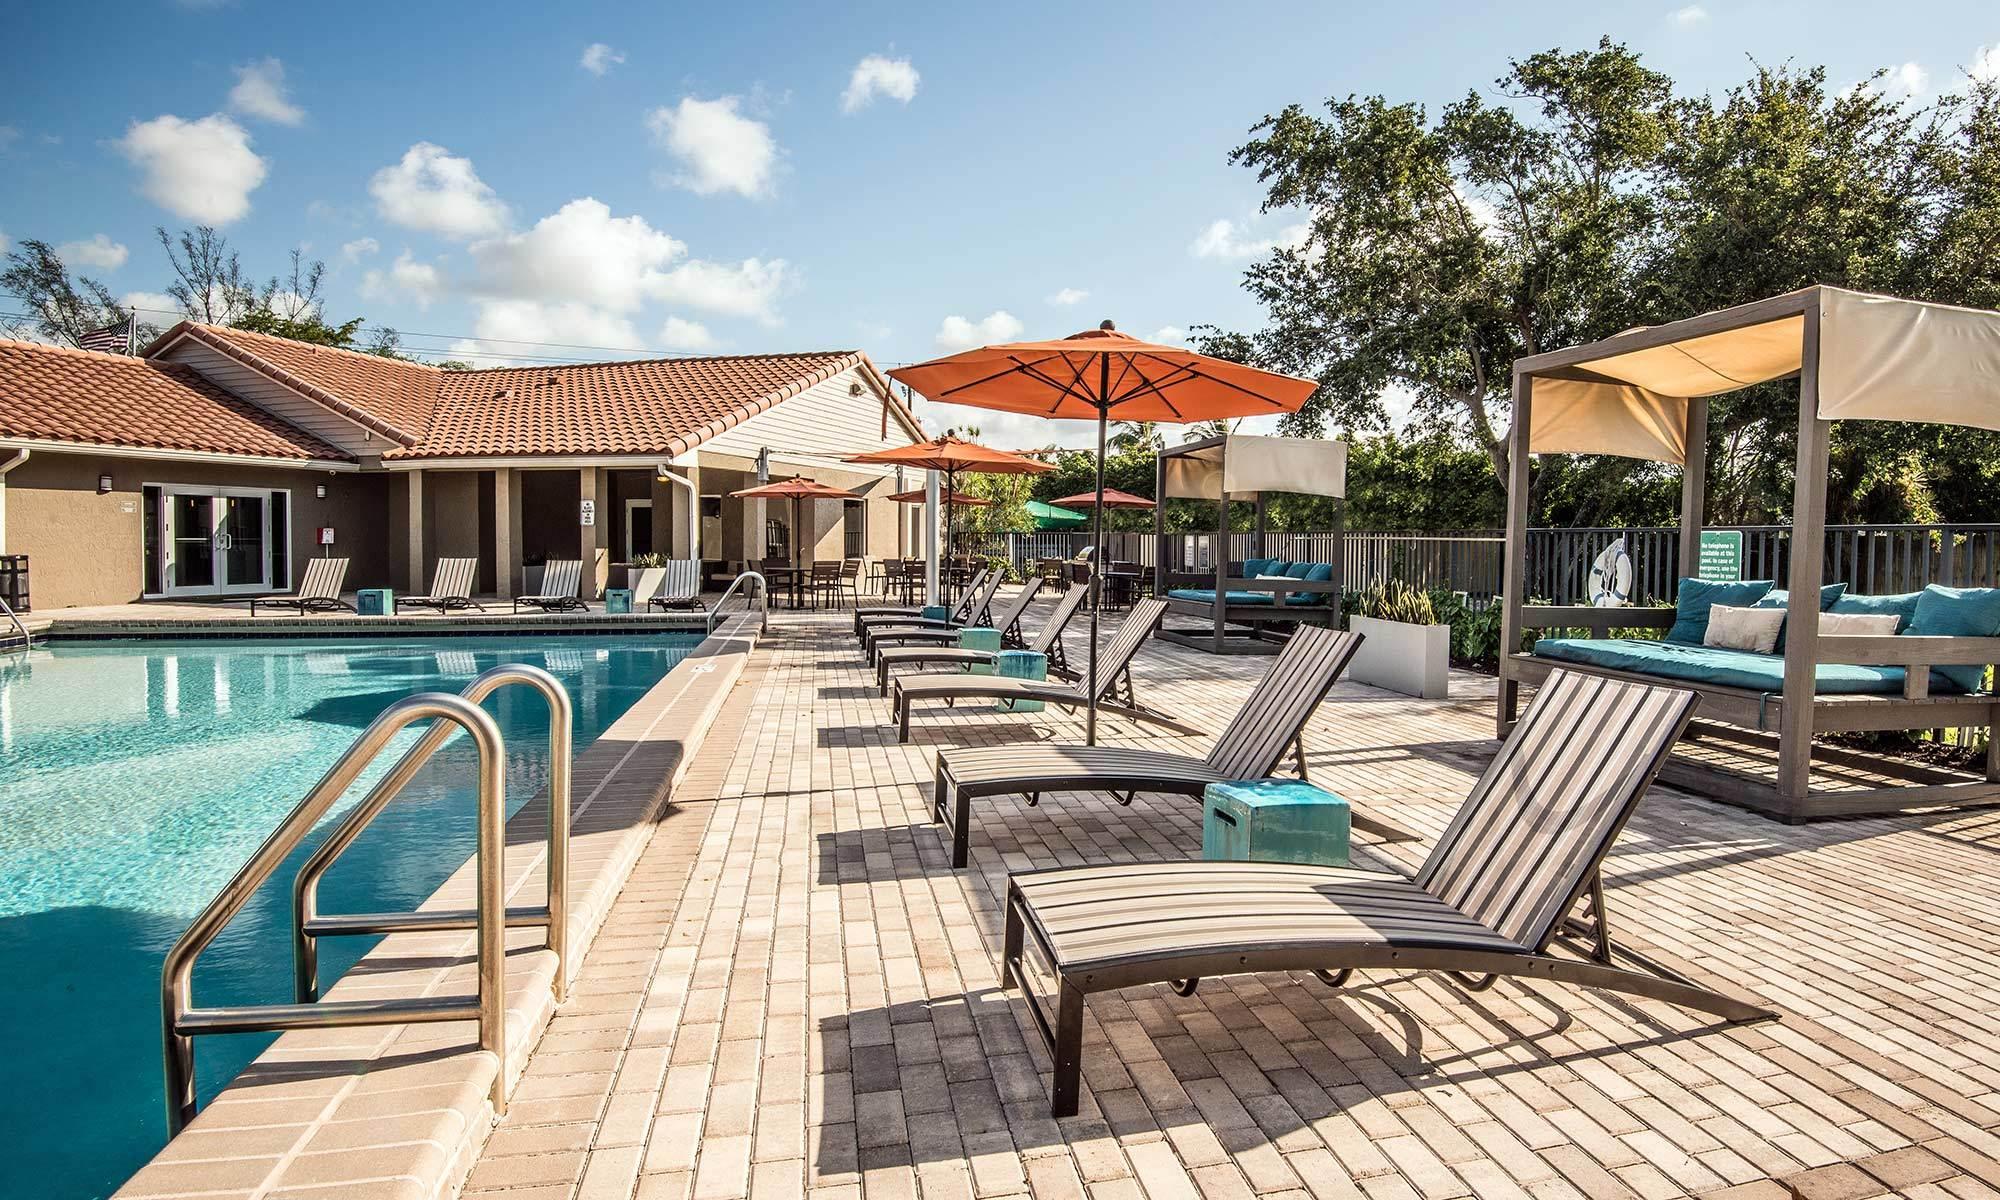 Apartments in Deerfield Beach, FL